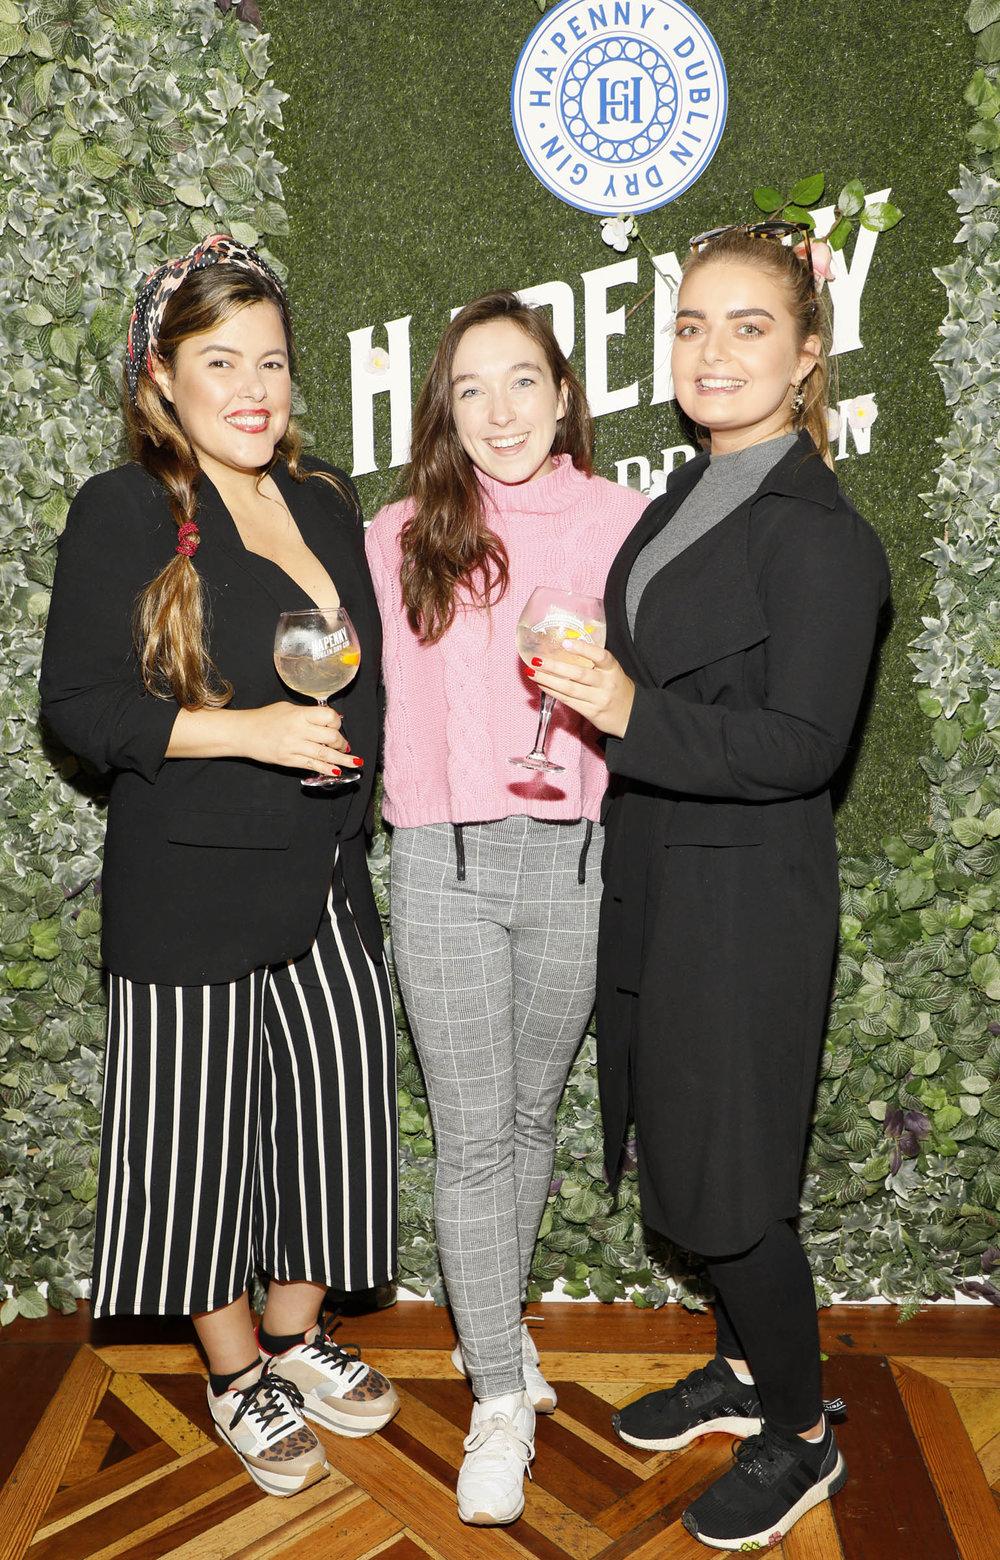 Sofia Delgado, Aine Leech and Aoife Nolan at the launch of the Ha'penny Spirits range.jpg